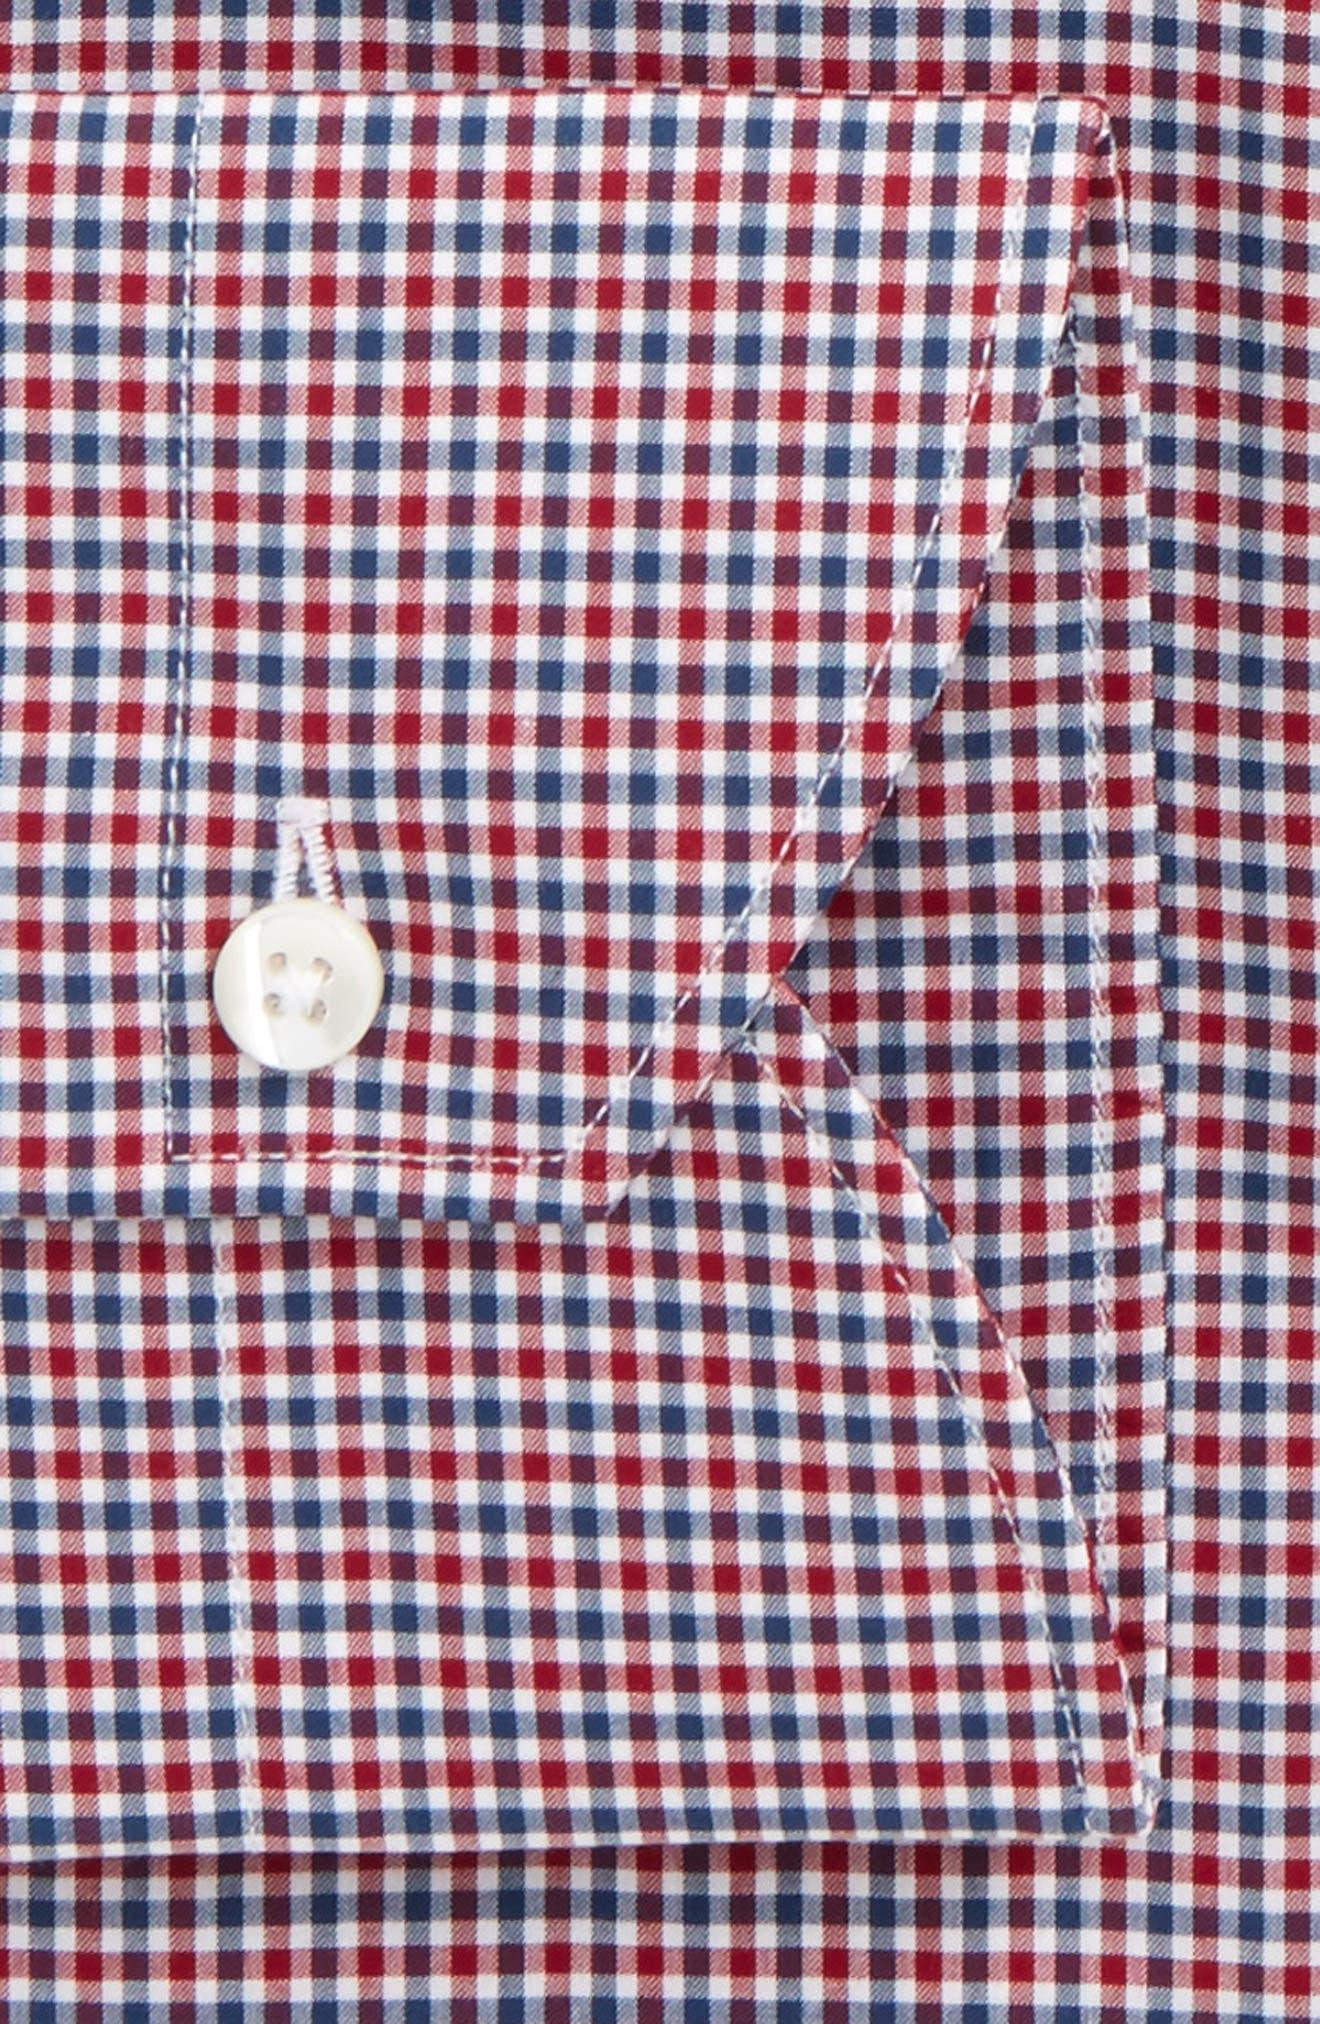 Regular Fit Dress Shirt,                             Alternate thumbnail 2, color,                             620